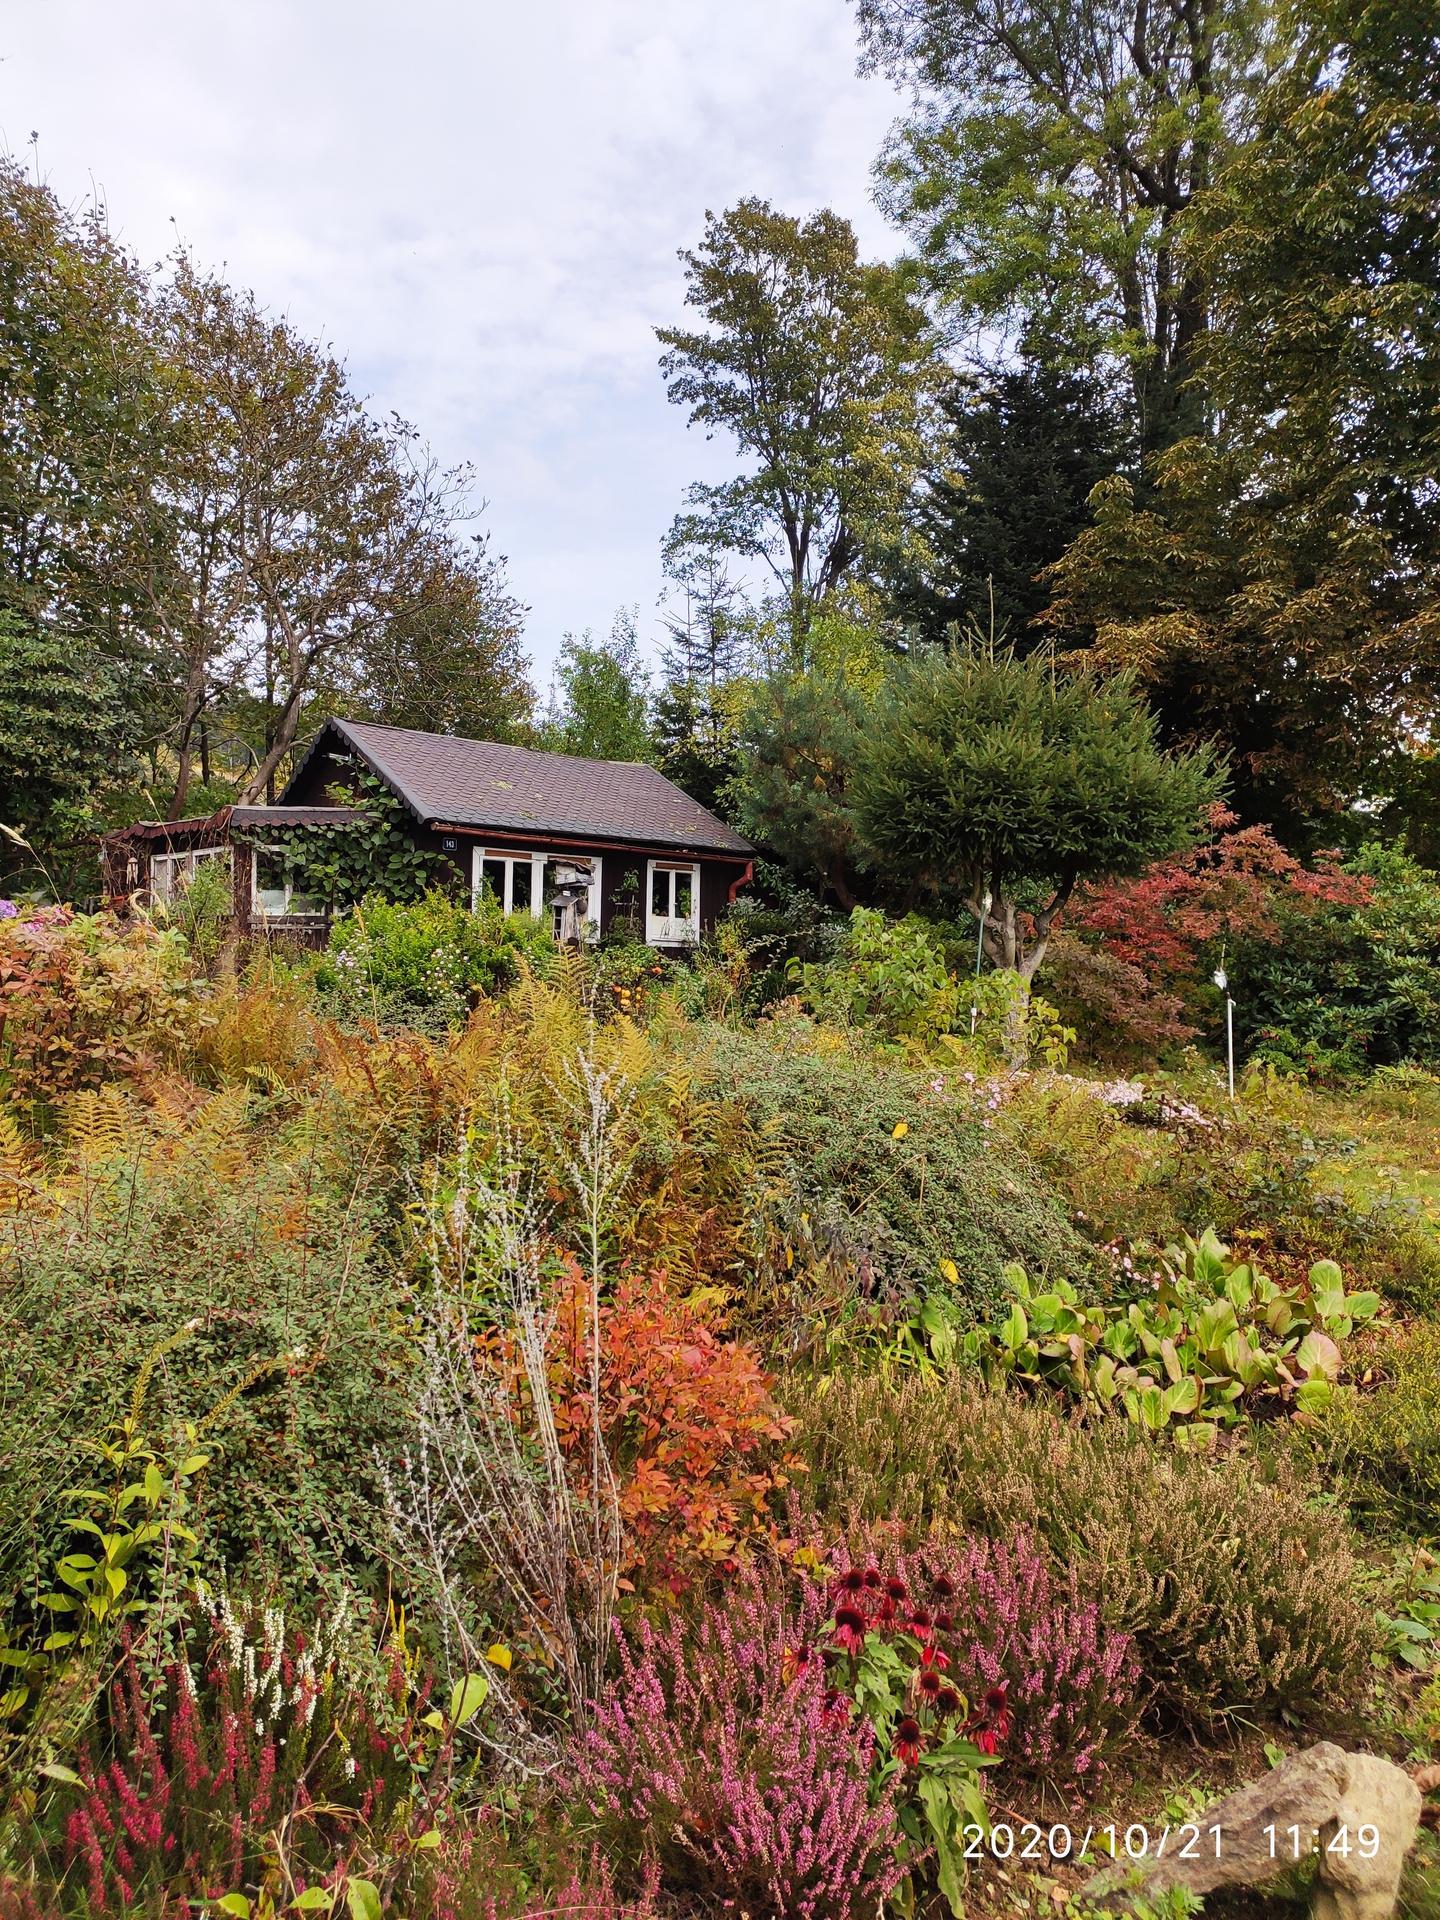 Tak a je tu podzim - Obrázek č. 3